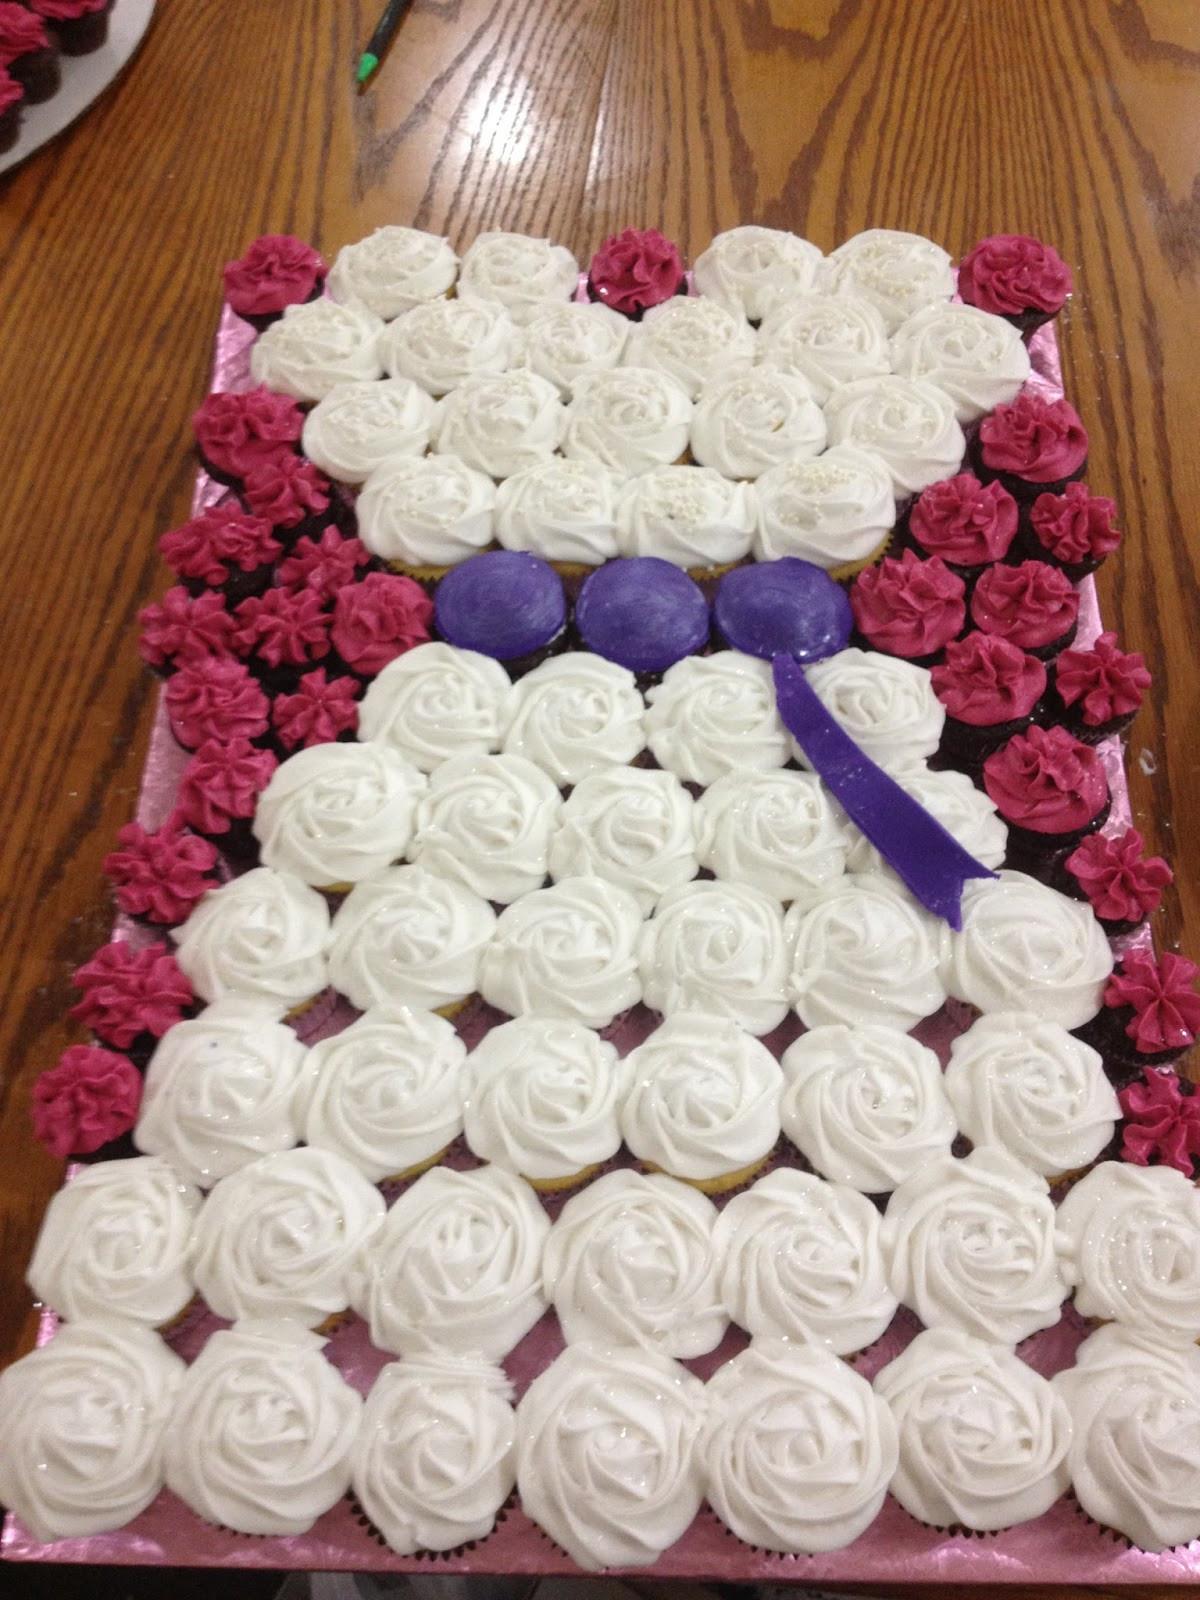 Wedding Shower Cupcakes  Life and Other Shenanigans Bridal Shower Cupcake Arrangement